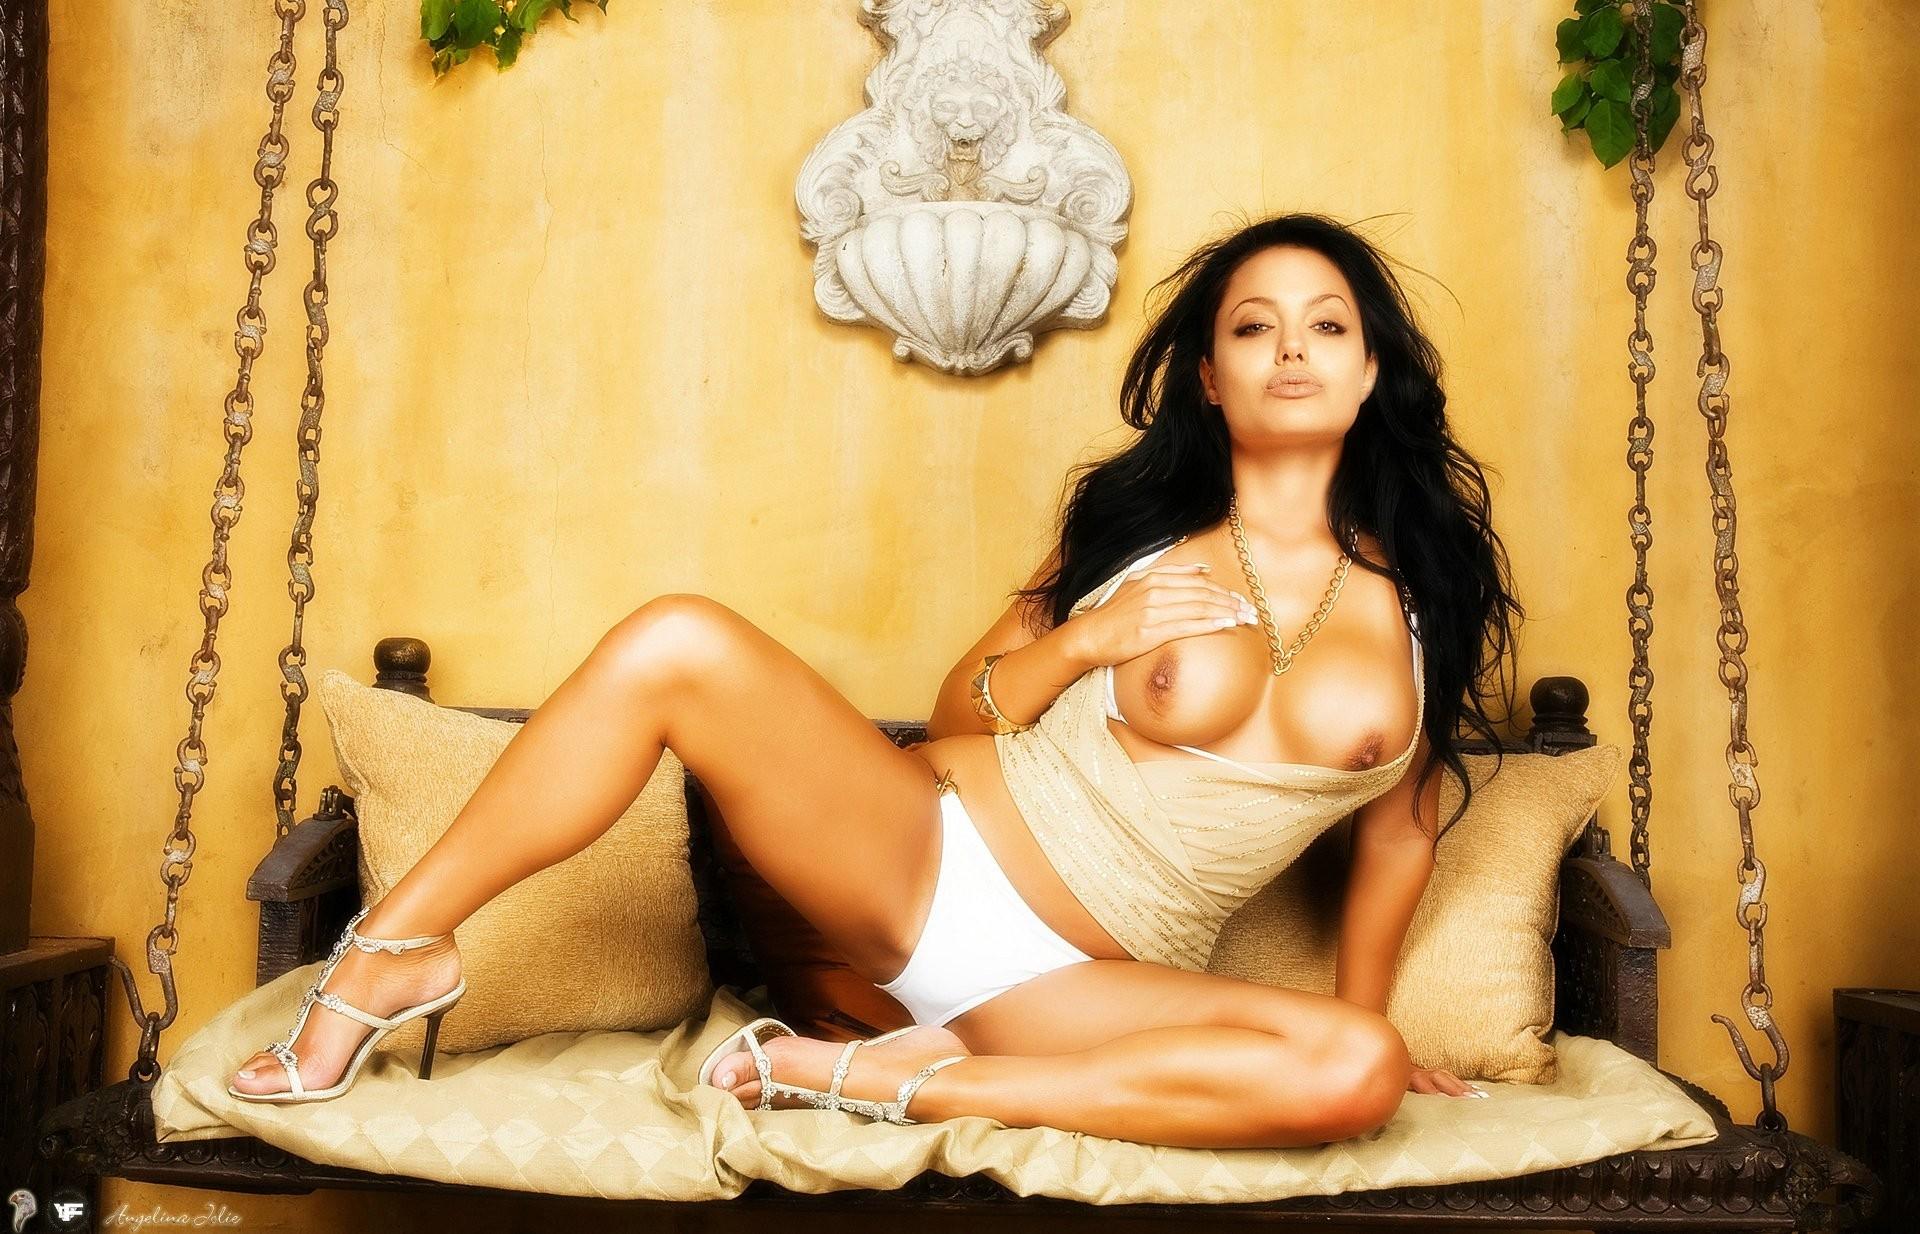 Angelina Jolie Film Nuda angelina jolie loves getting fucked doggiestyle on the floor